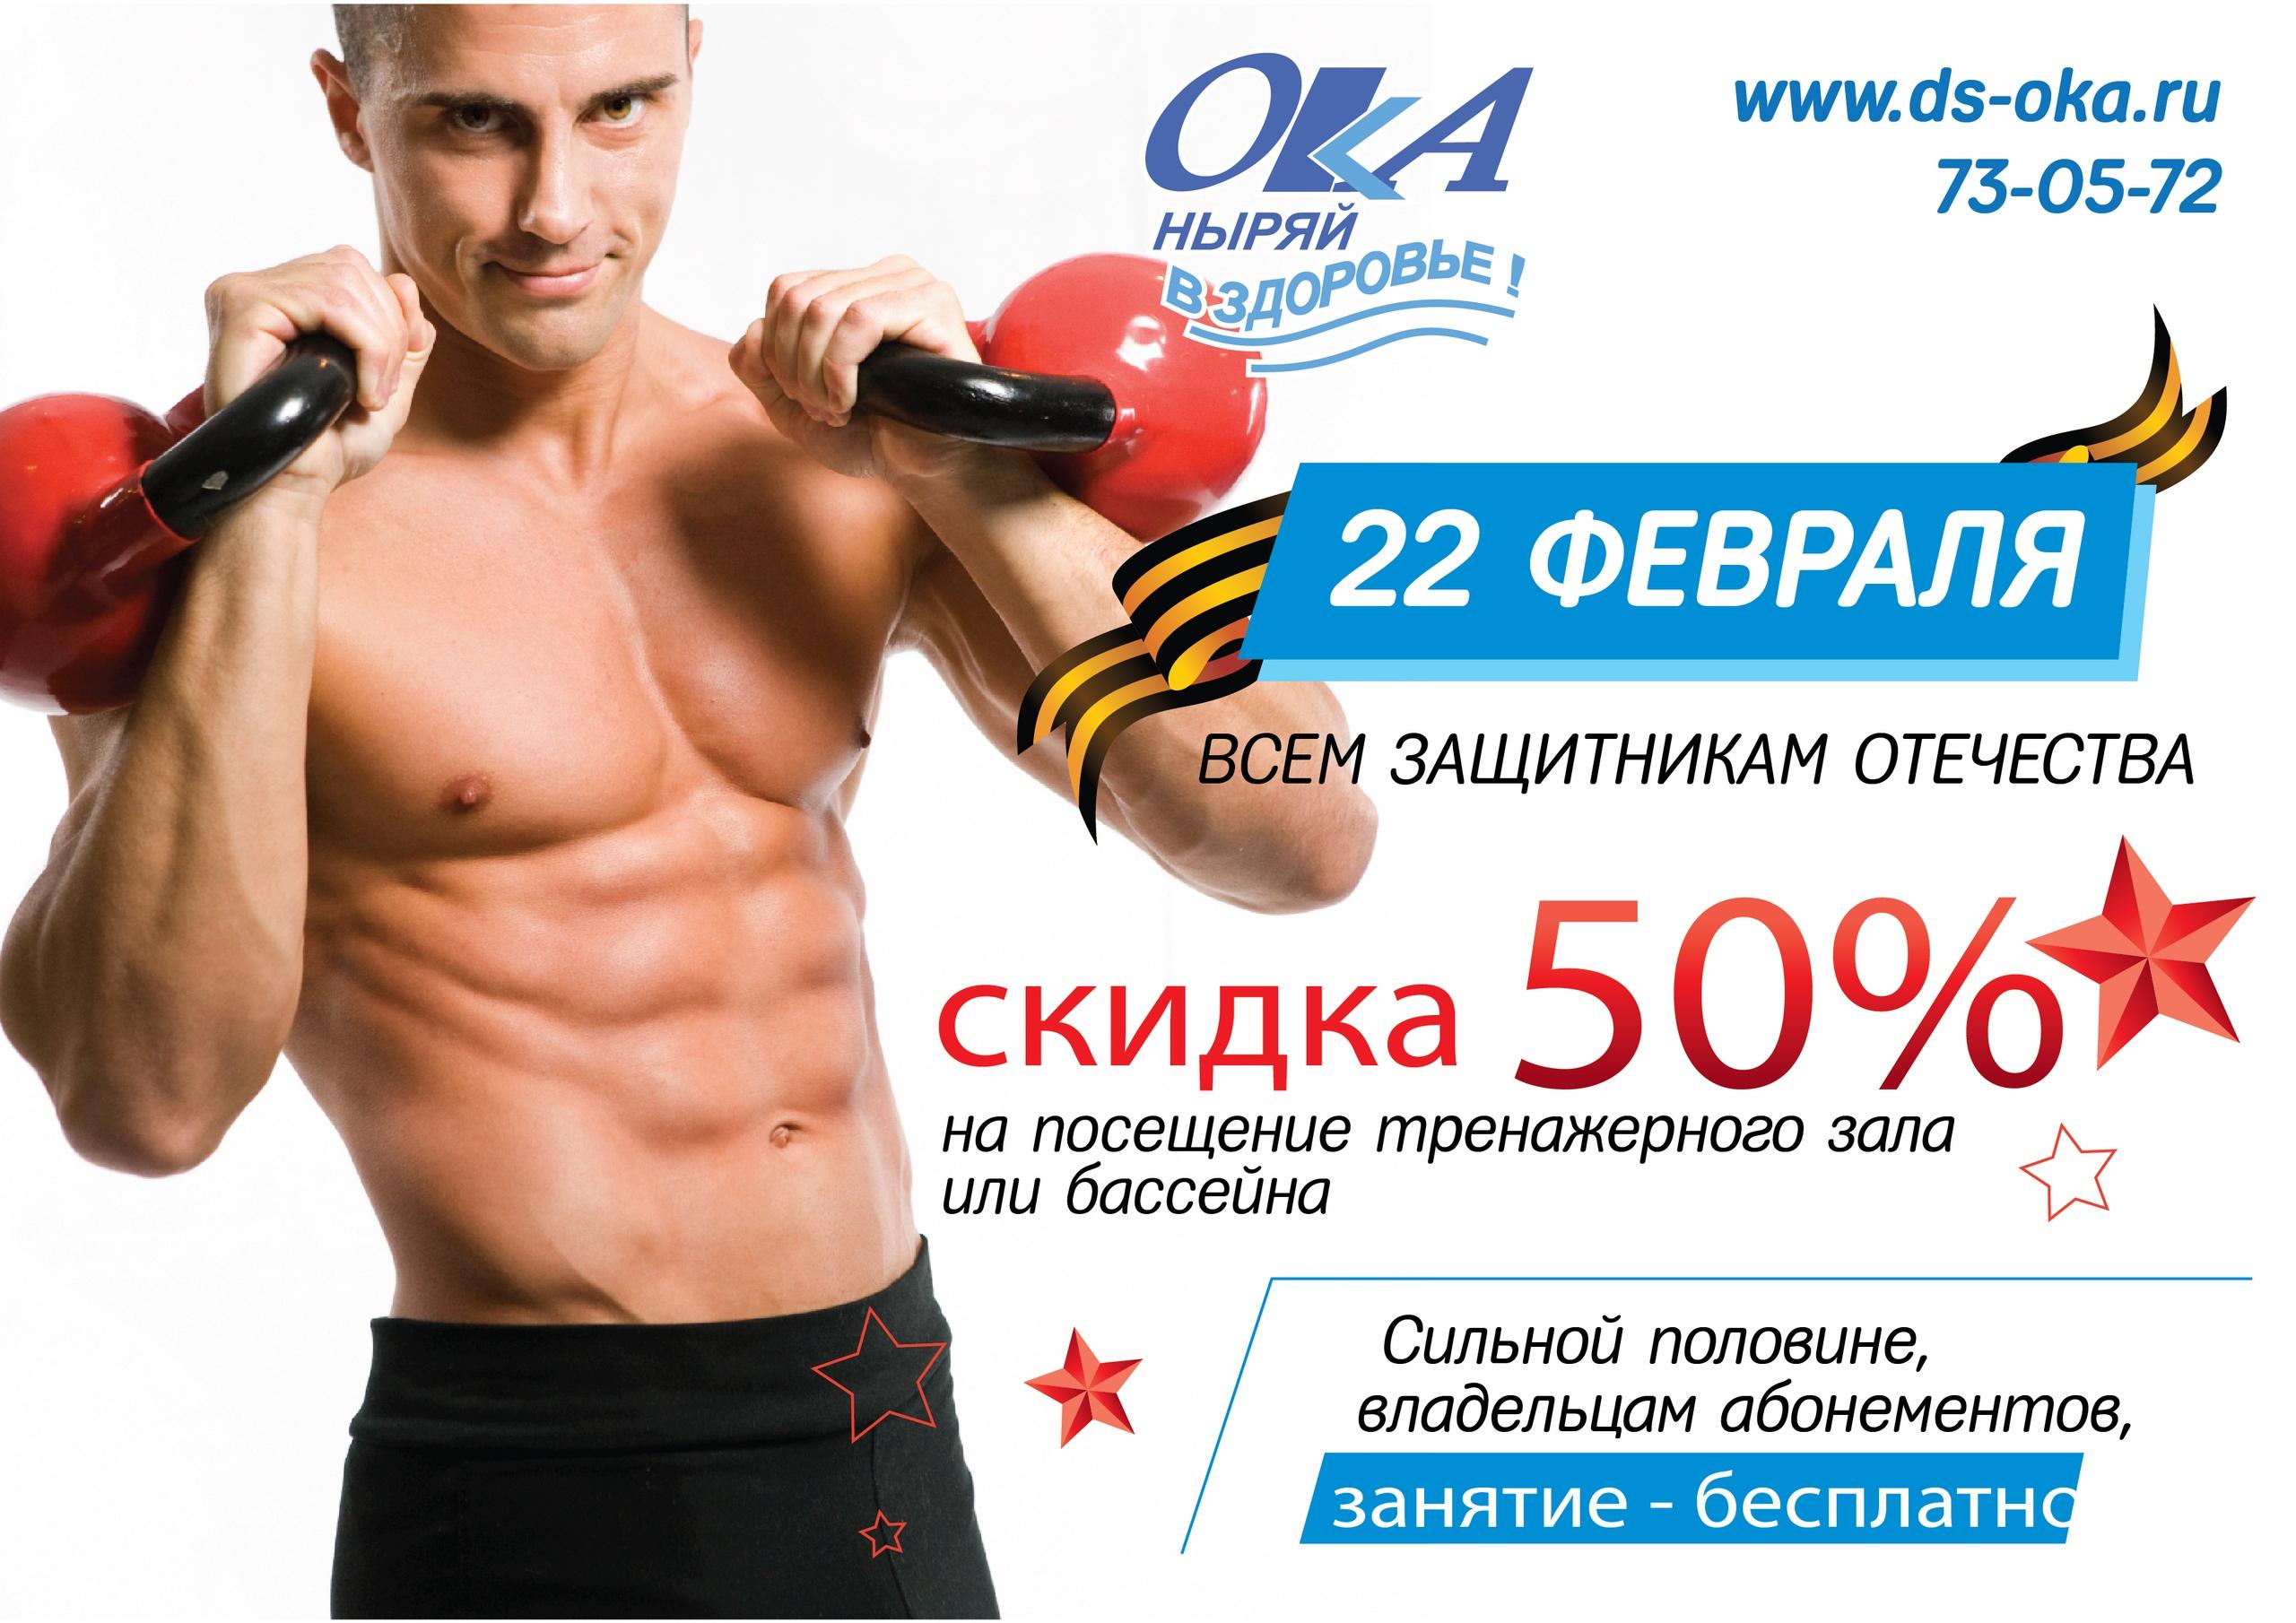 Дворец спорта «Ока» дарит подарки для настоящих мужчин!